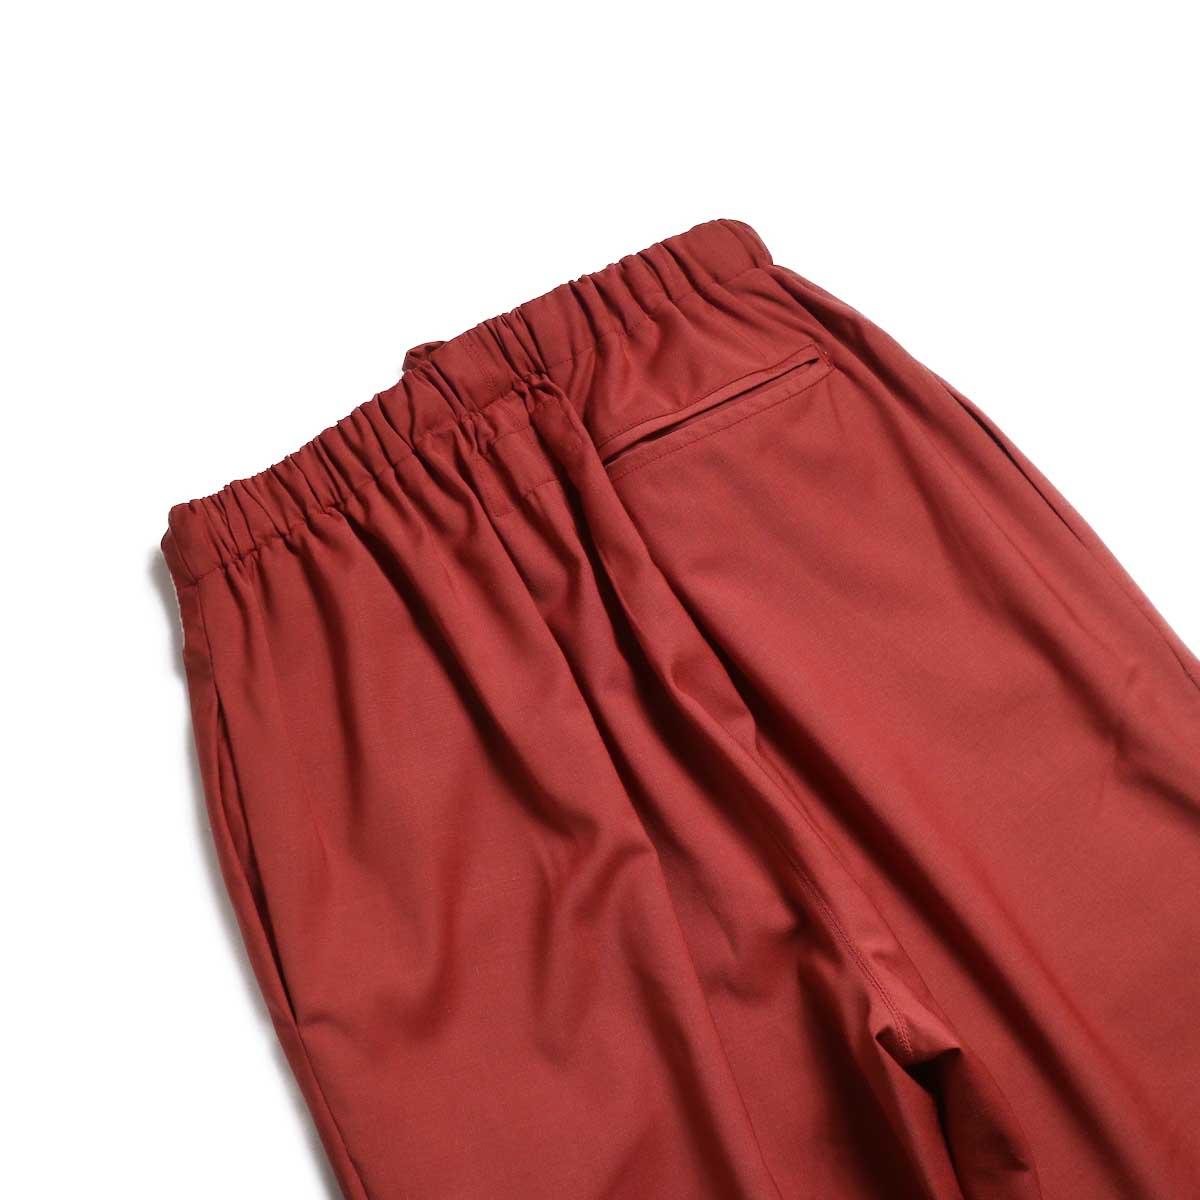 BASISBROEK / BRAVO Cropped Easy Pants (Sienna) バックポケット